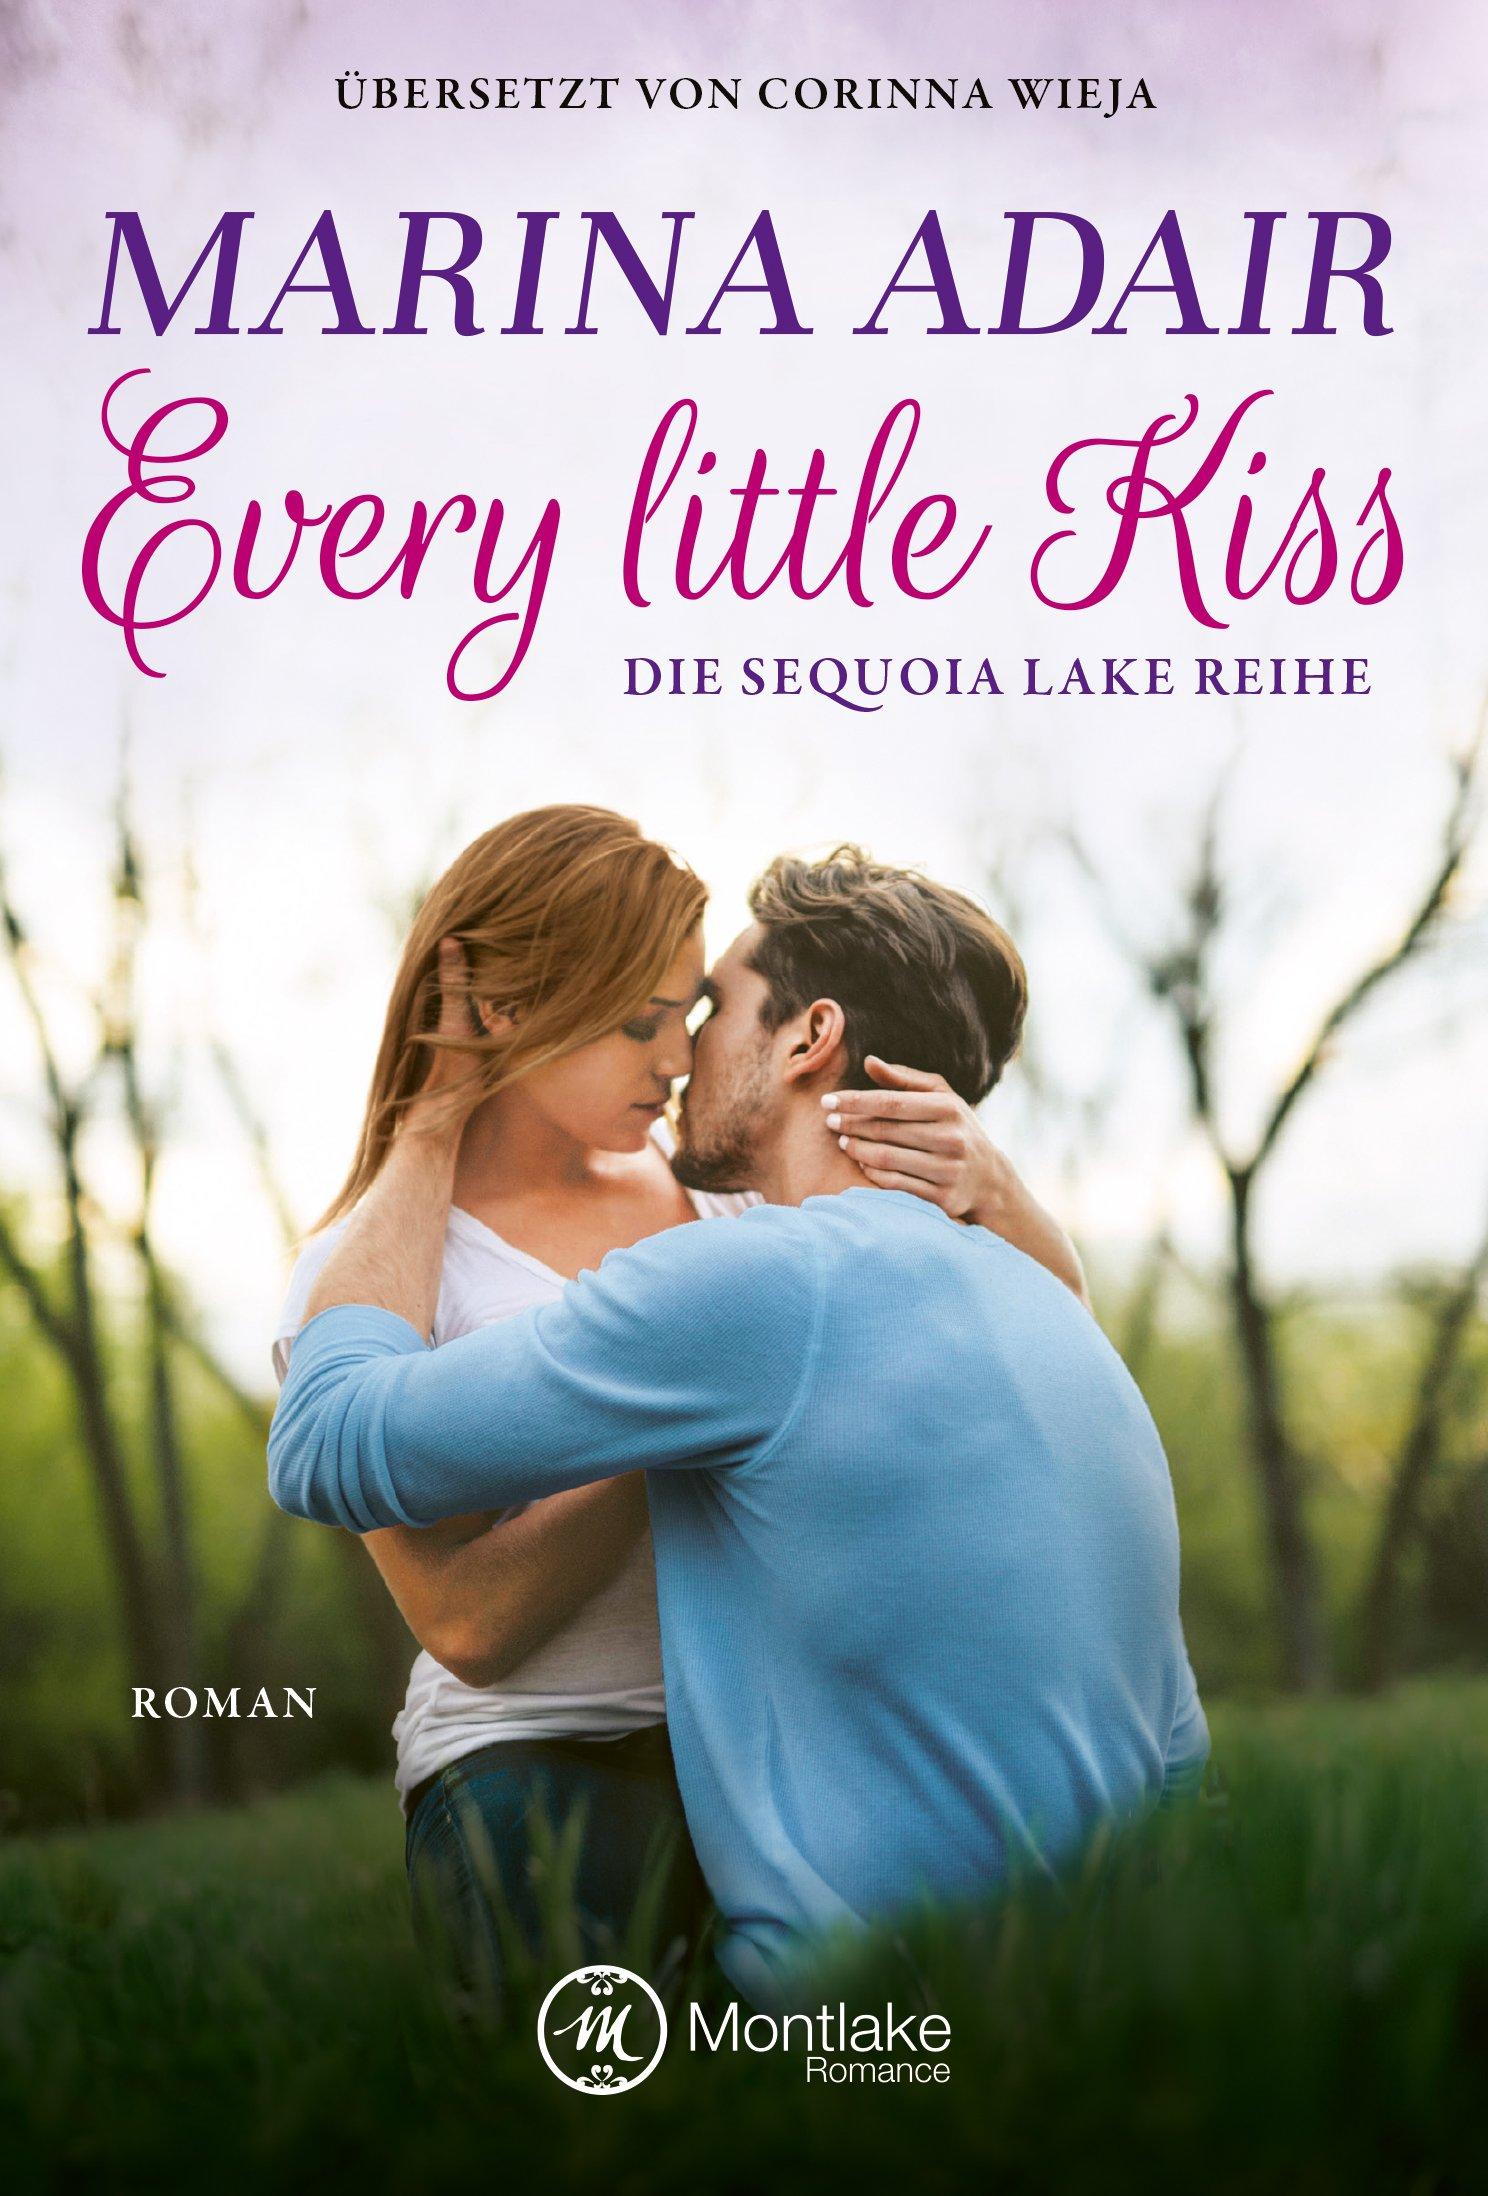 Every little kiss (Sequoia Lake, Band 2) Taschenbuch – 4. September 2018 Marina Adair Corinna Wieja Montlake Romance 2919802003